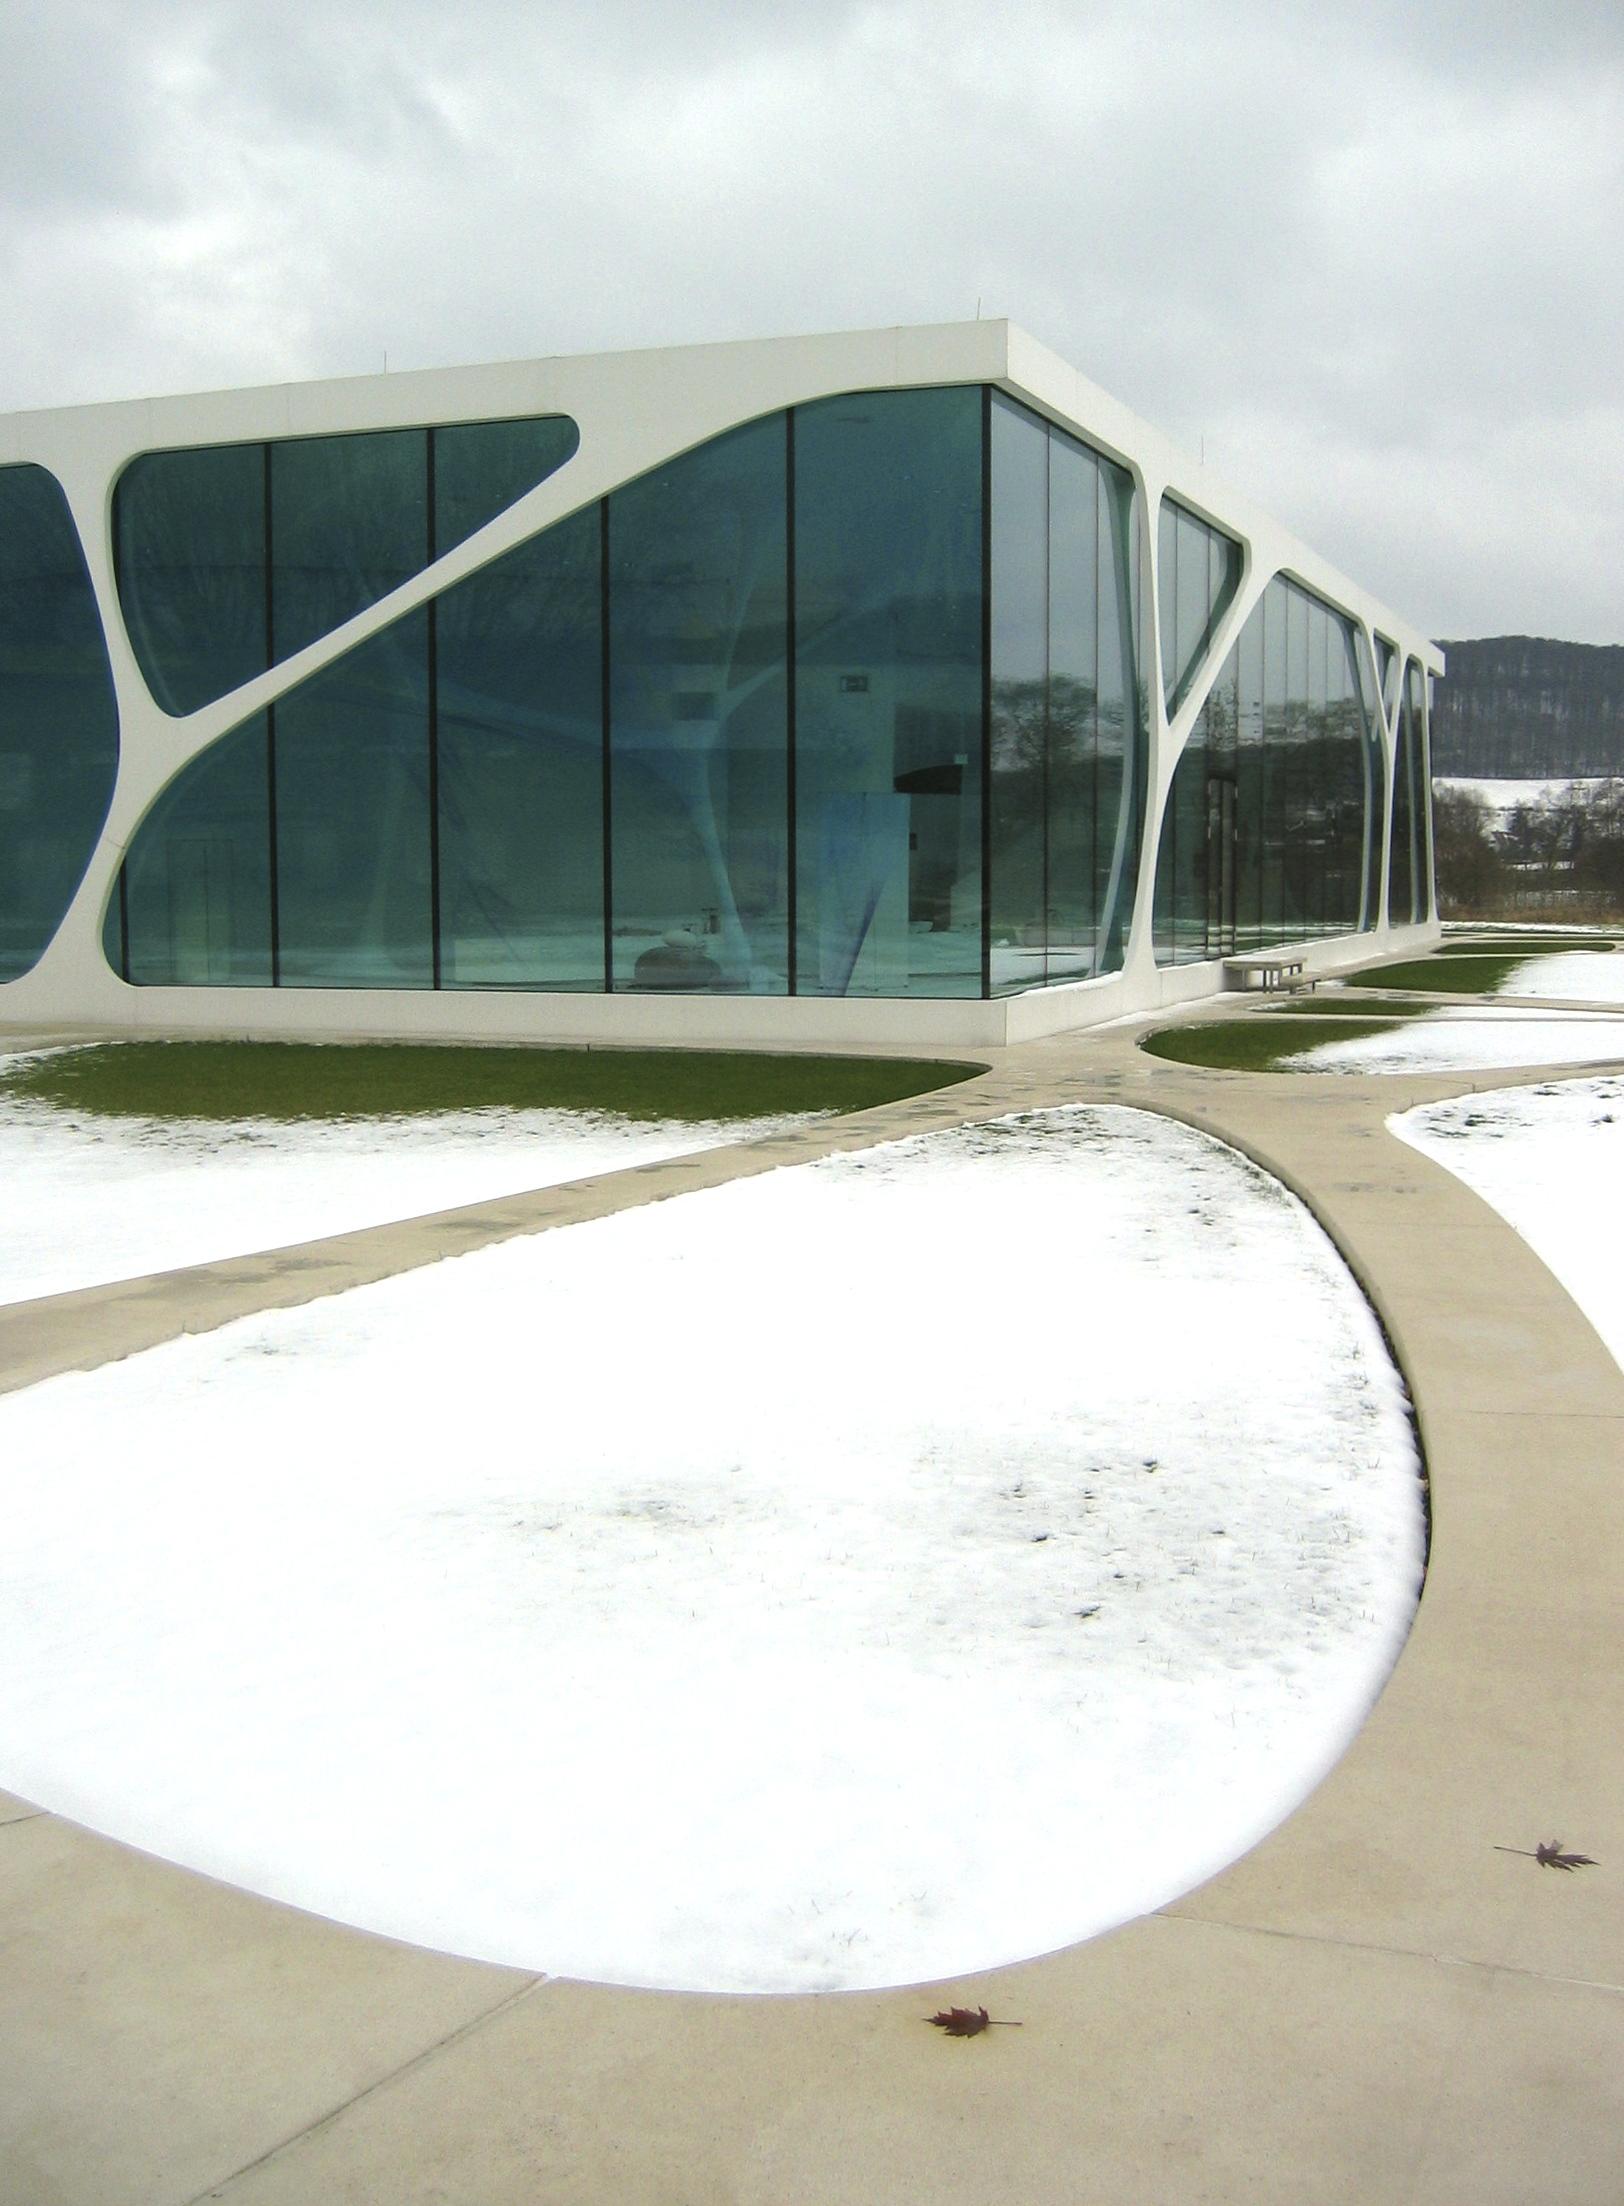 file glaskoch herste leonardo glass cube 2010 wikimedia commons. Black Bedroom Furniture Sets. Home Design Ideas